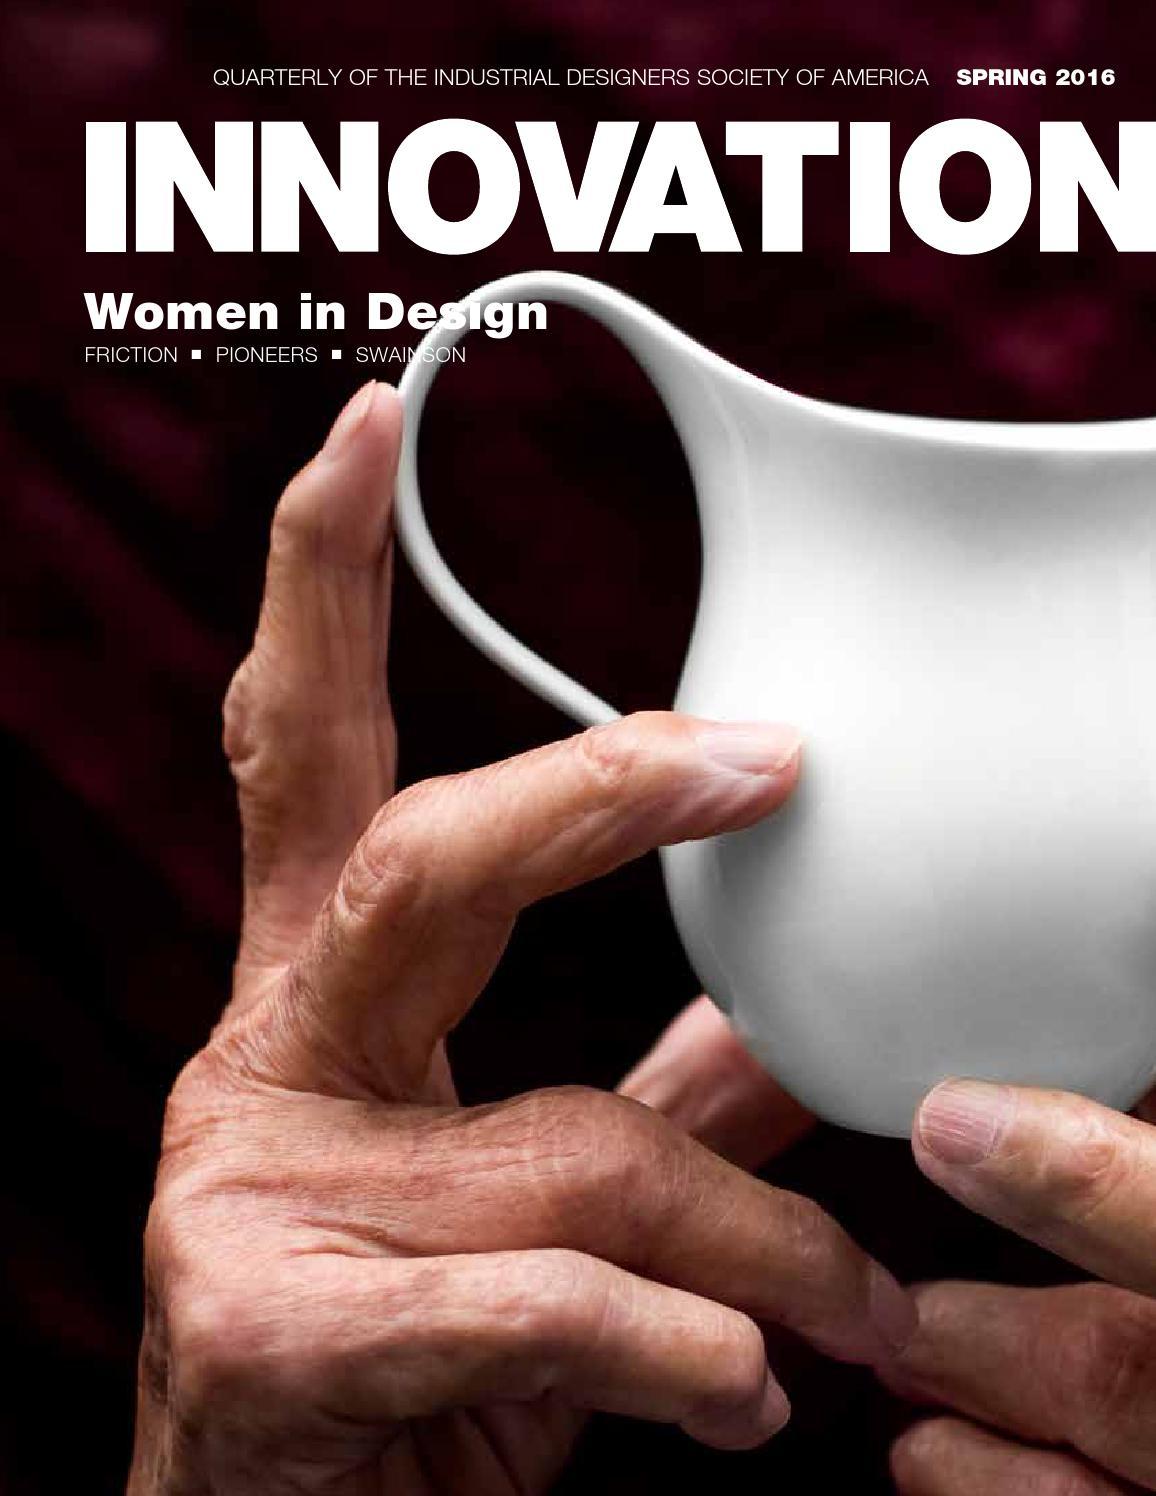 cf342c6b1605 Innovation Spring 2016  Women in Design by Industrial Designers Society of  America - issuu